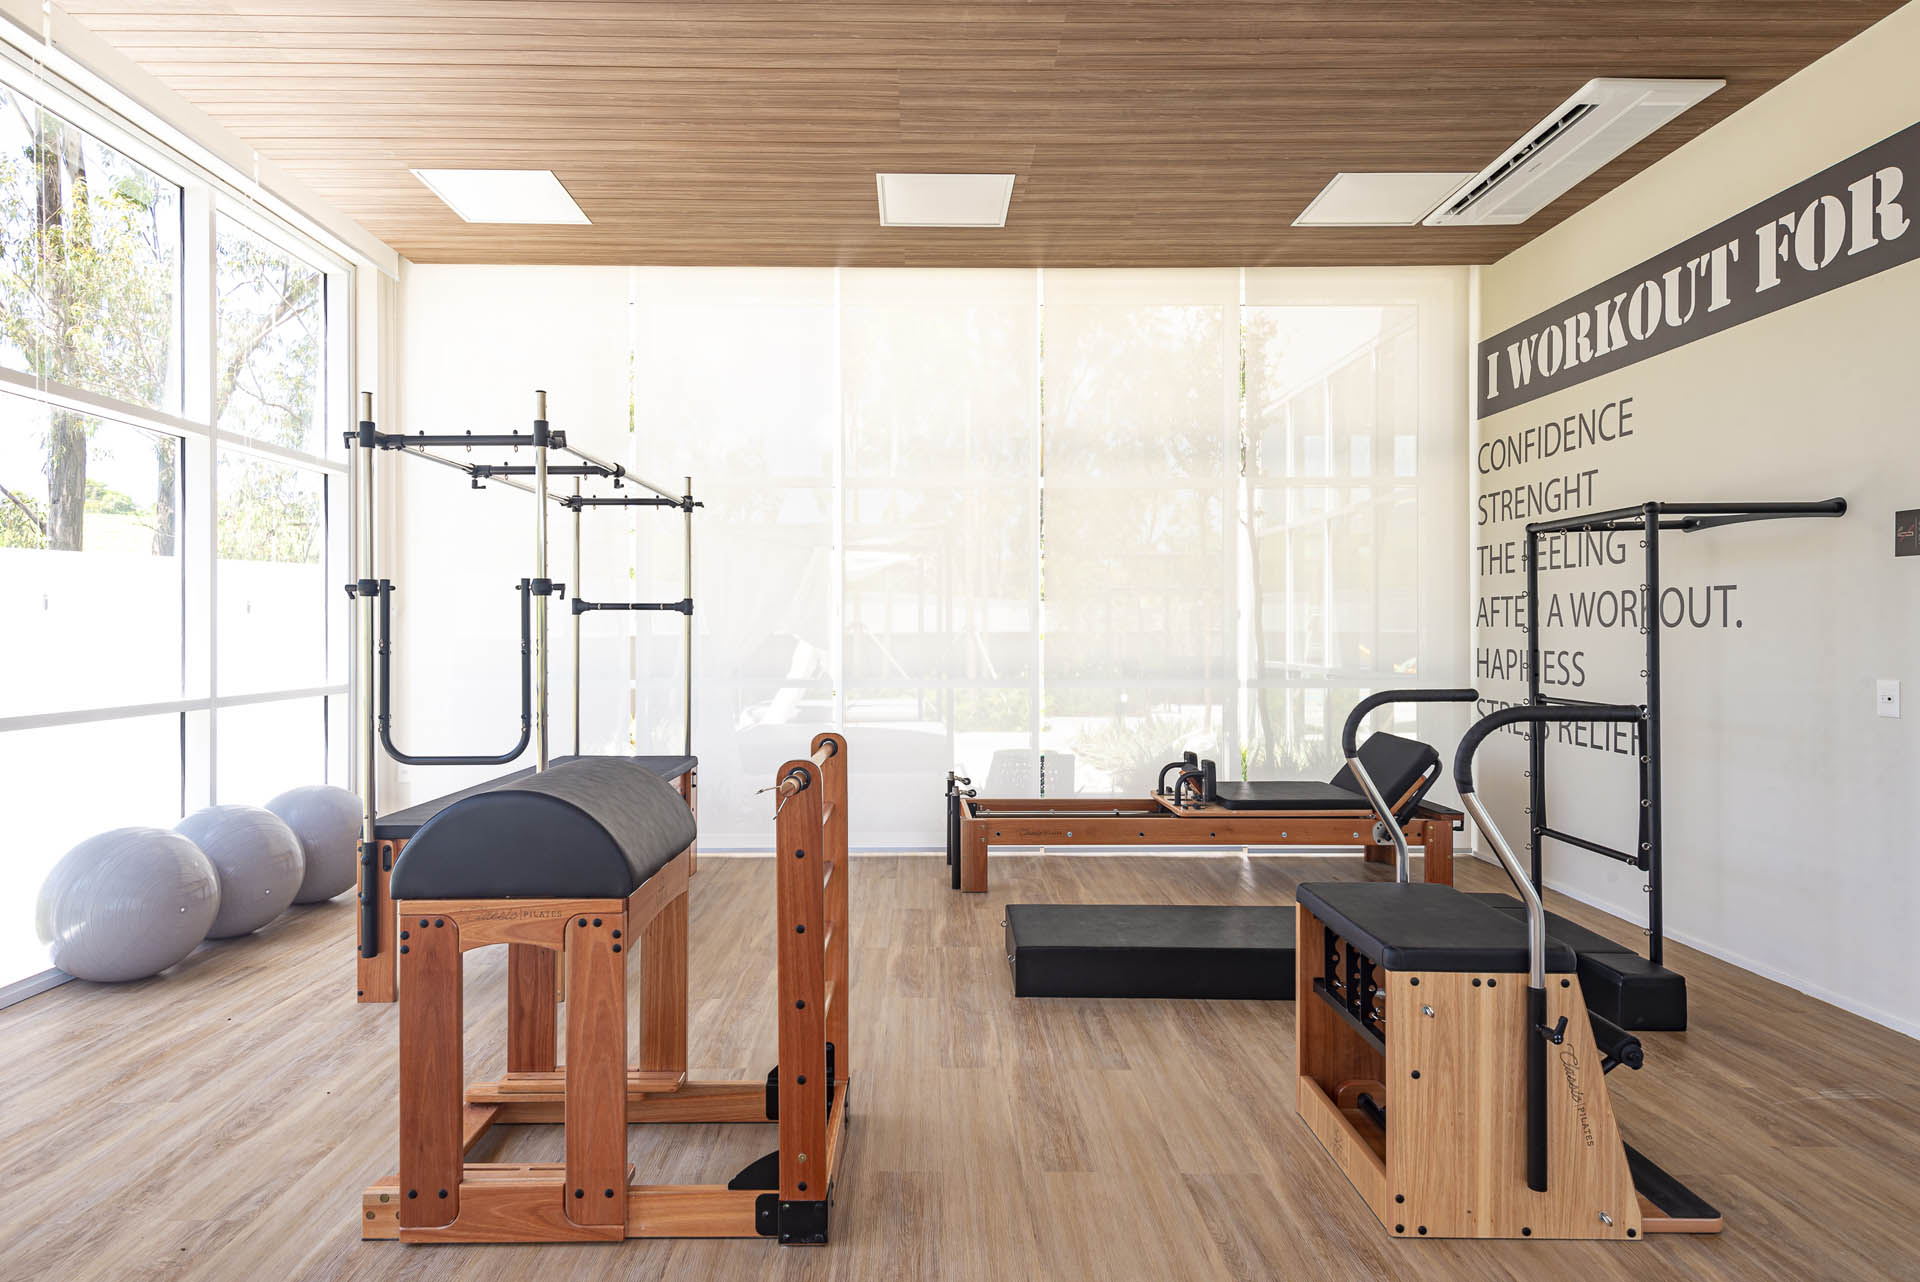 Foto da Sala de Pilates